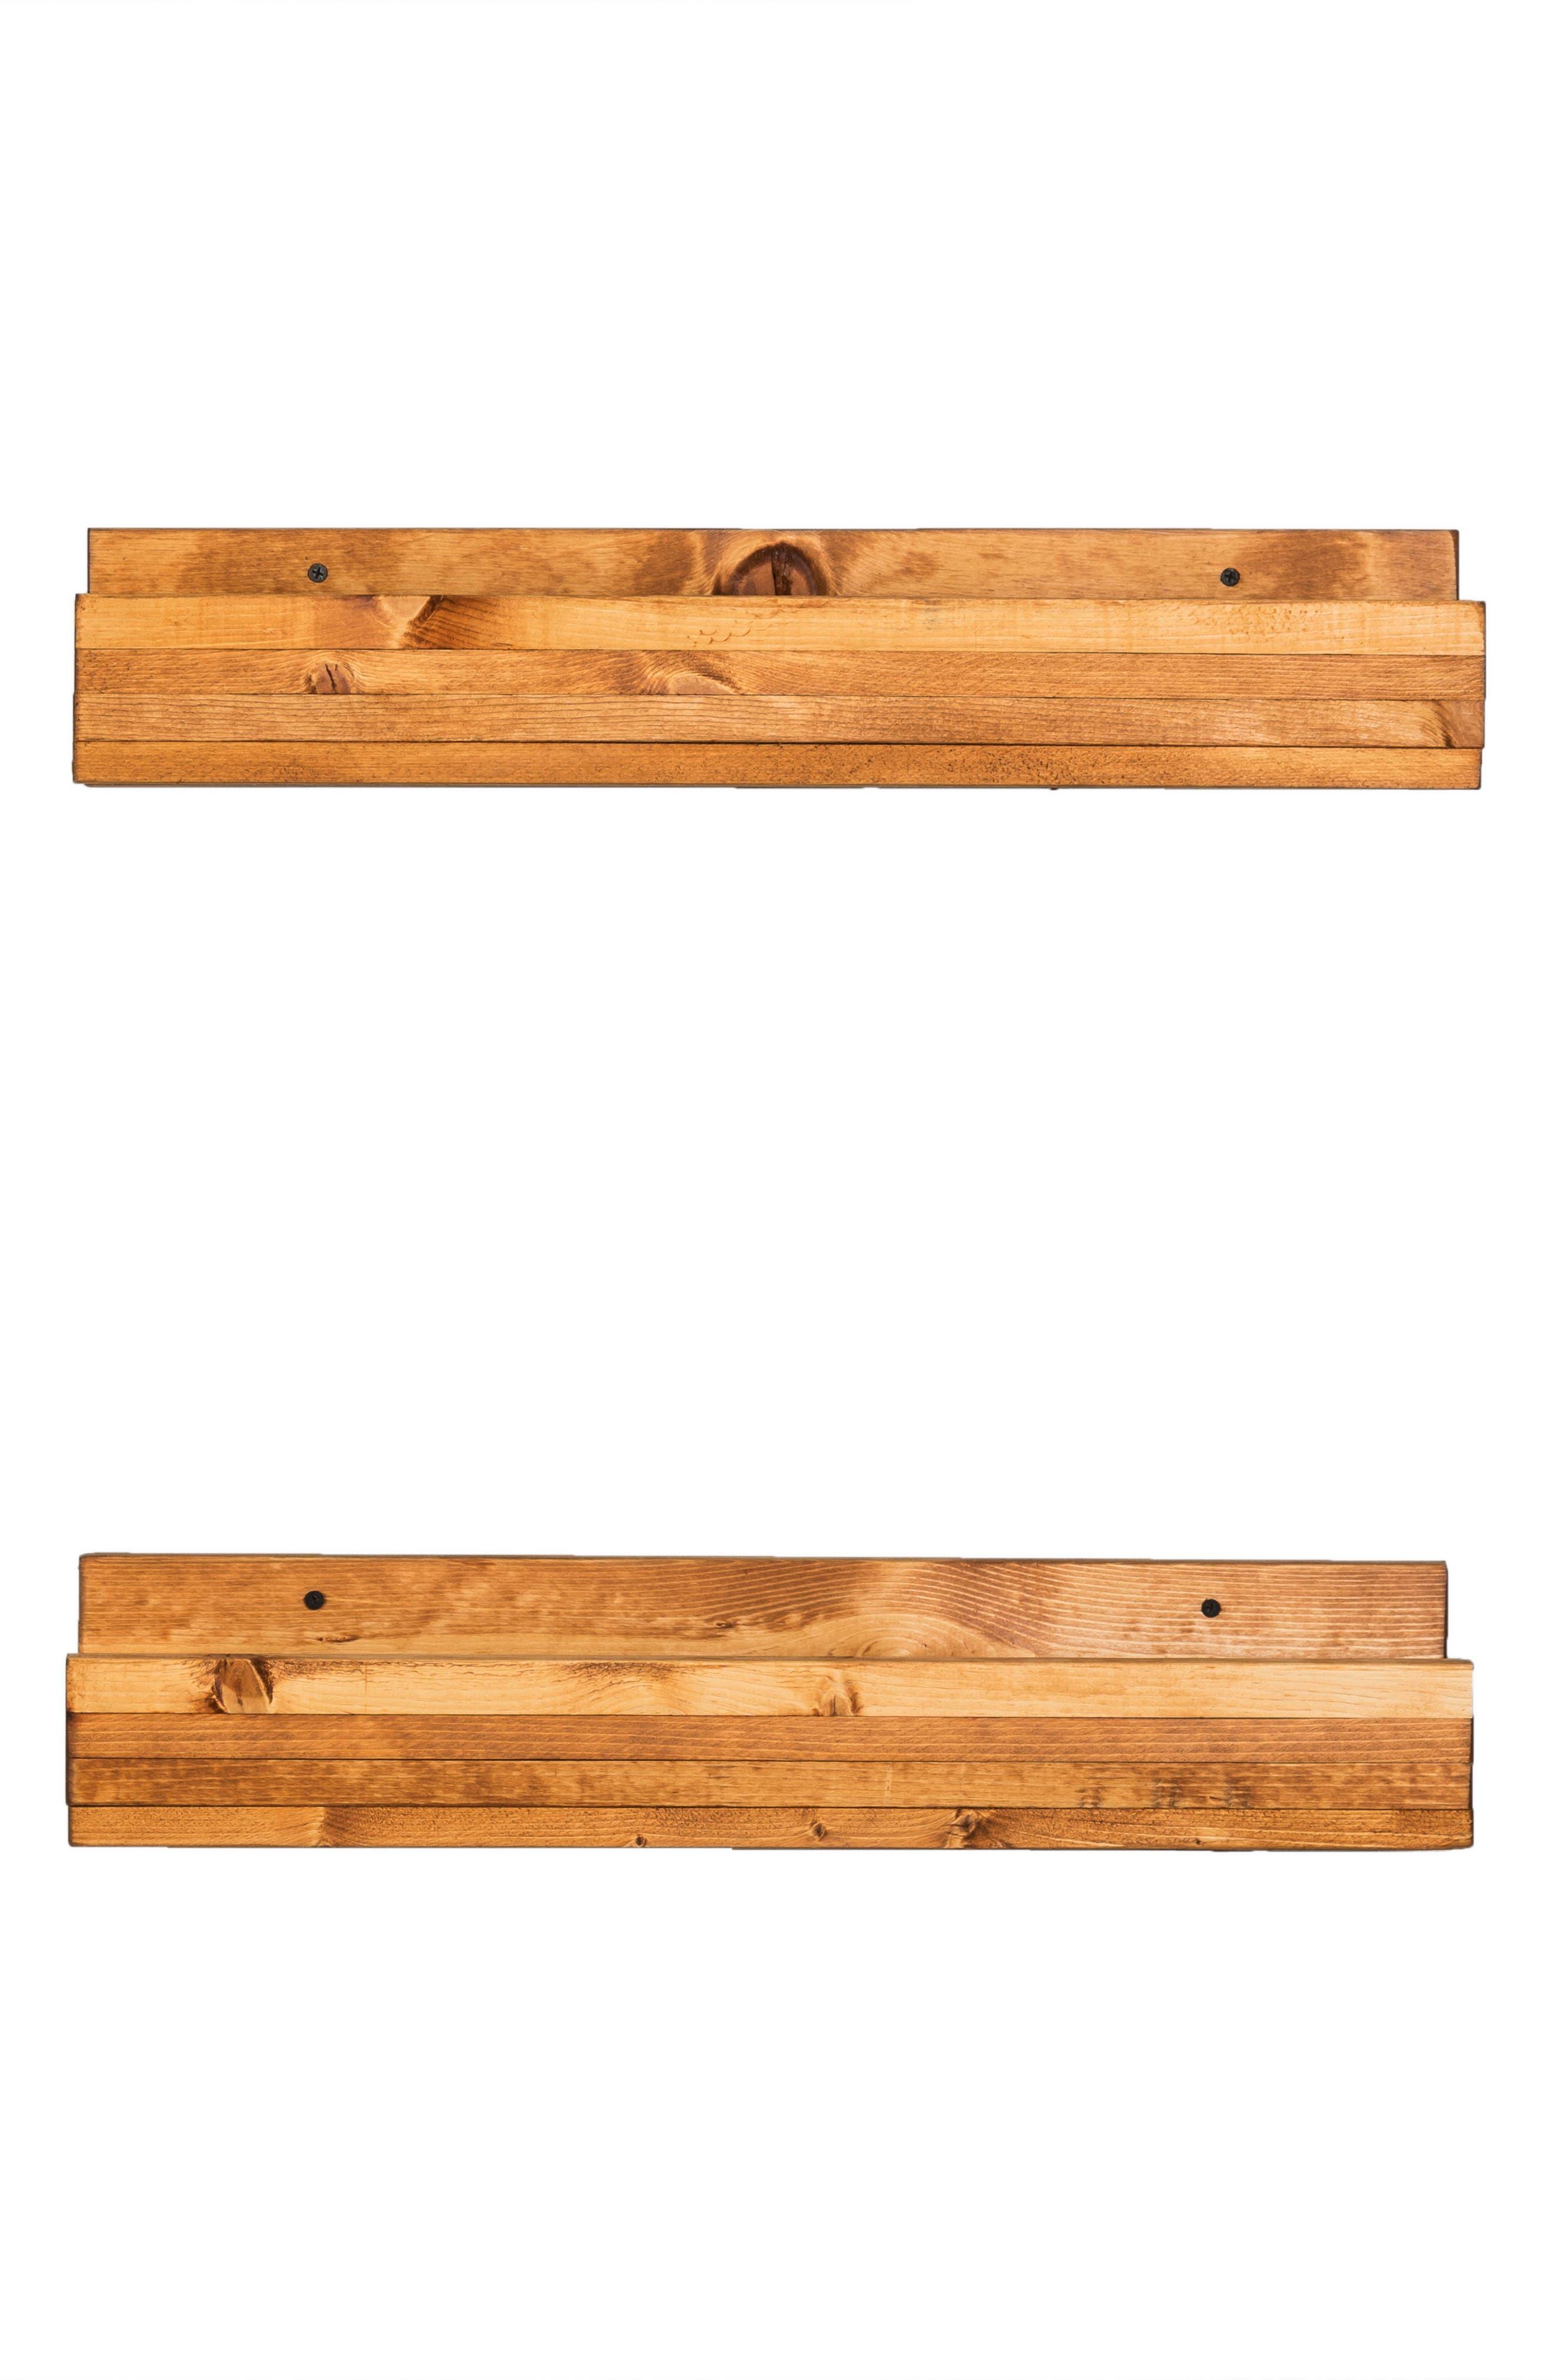 Main Image - (del)Hutson Designs Set of 2 Pine Wood Wine Racks